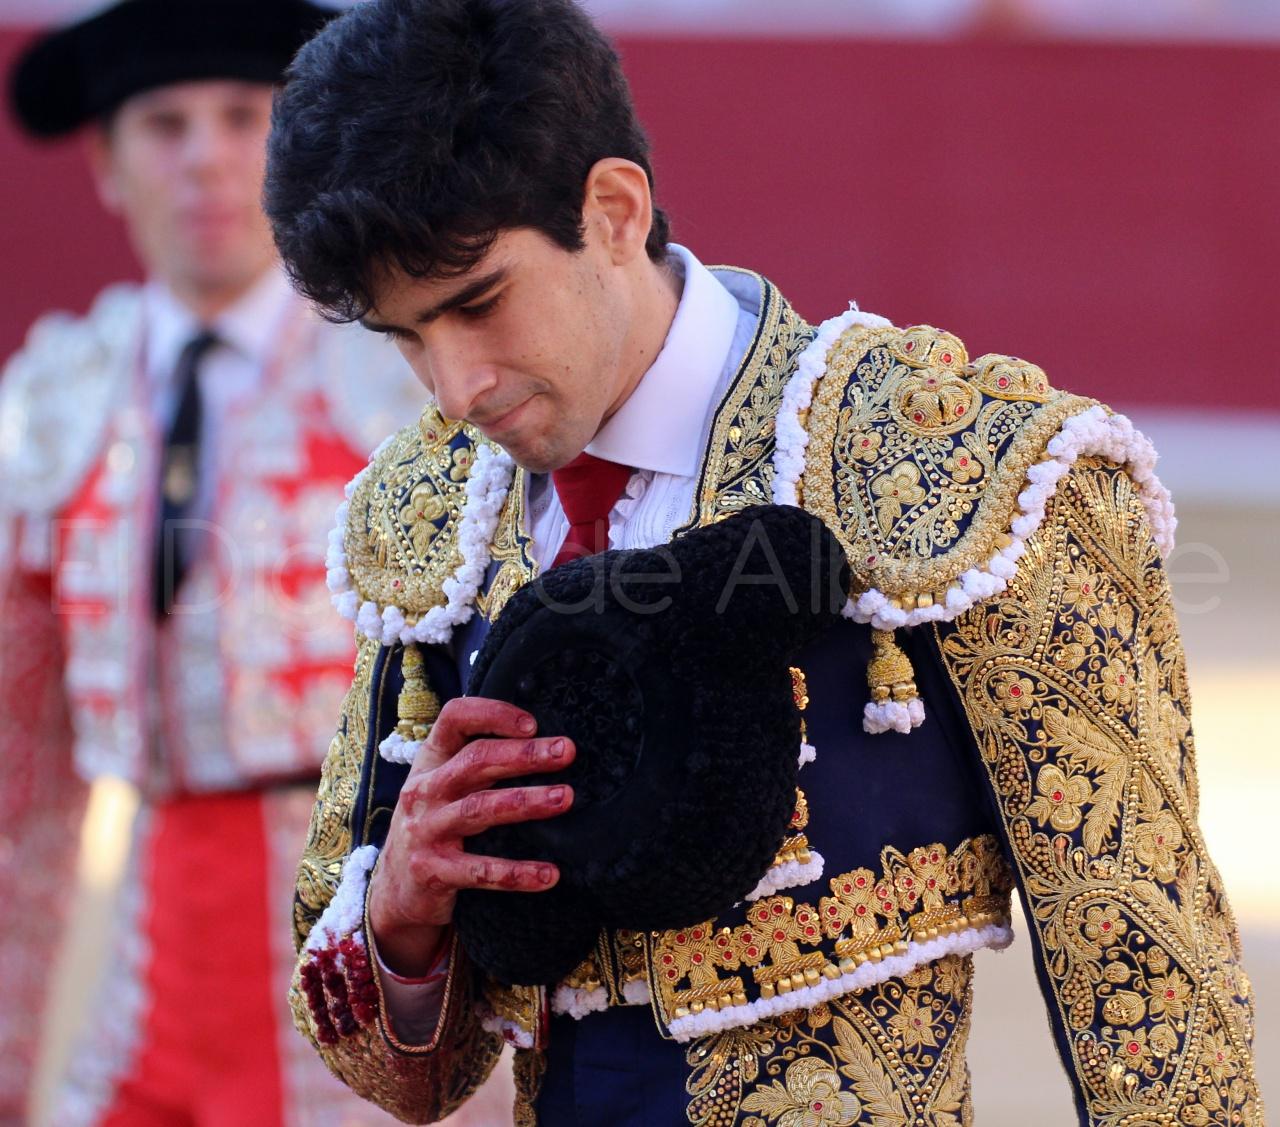 El Juli Lopez Simon y Garrido Feria Albacete 2015 toros  52